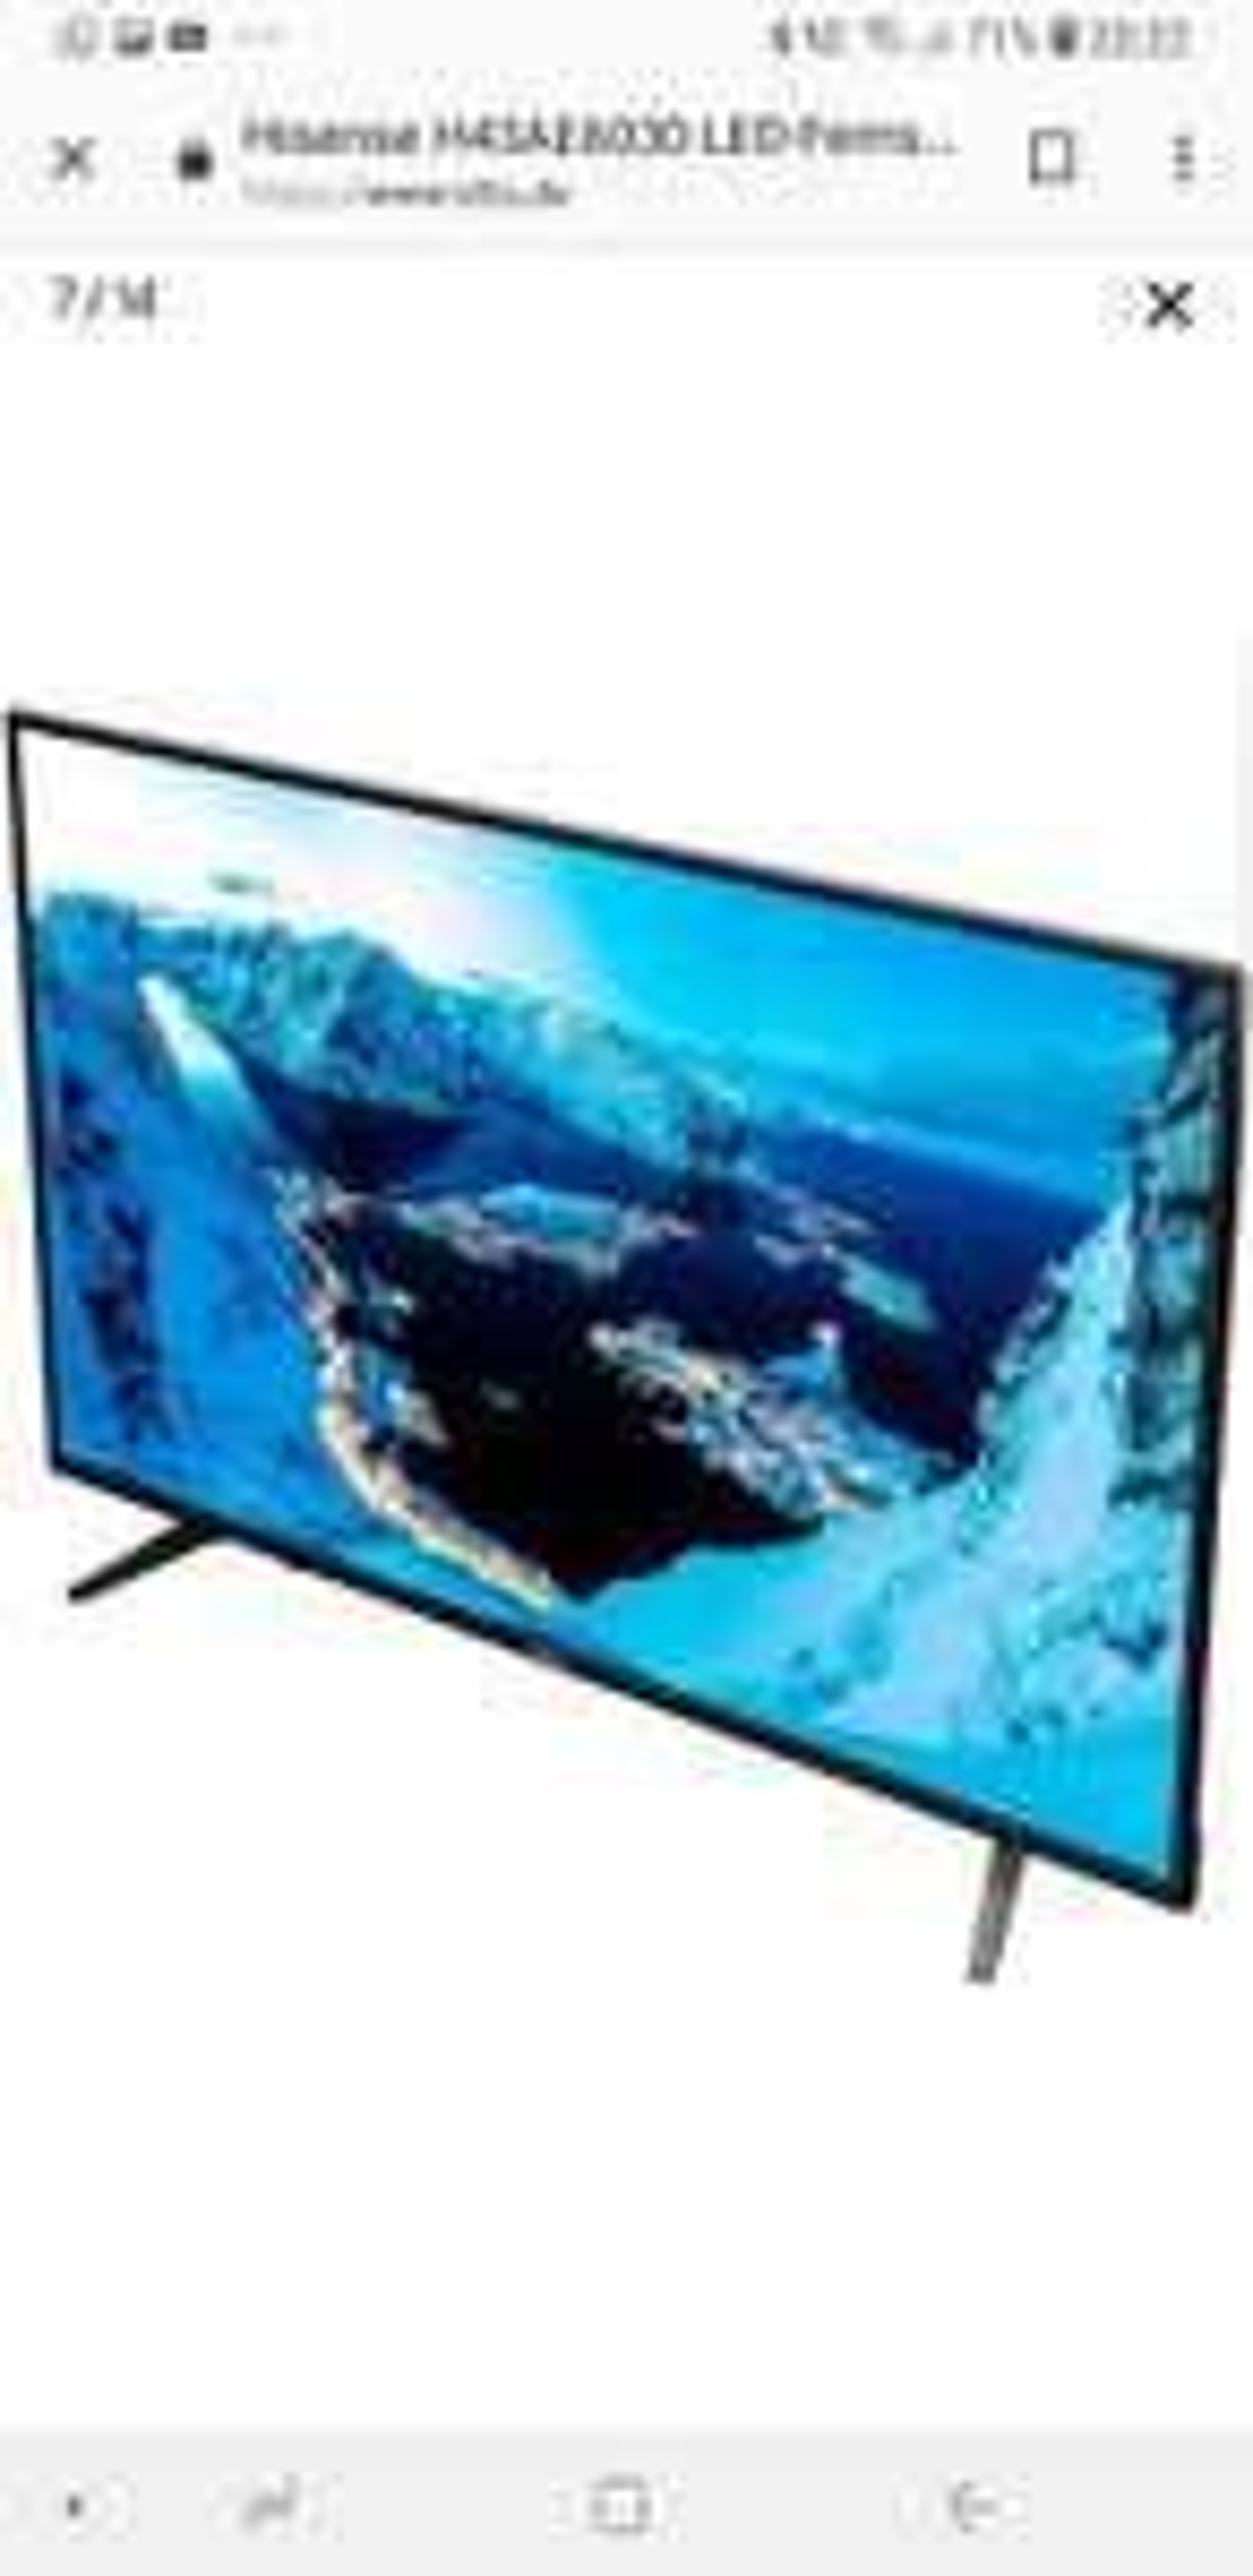 Hisense H43AE6030. 43 Zoll UHD 4K Fernseher bei Otto.